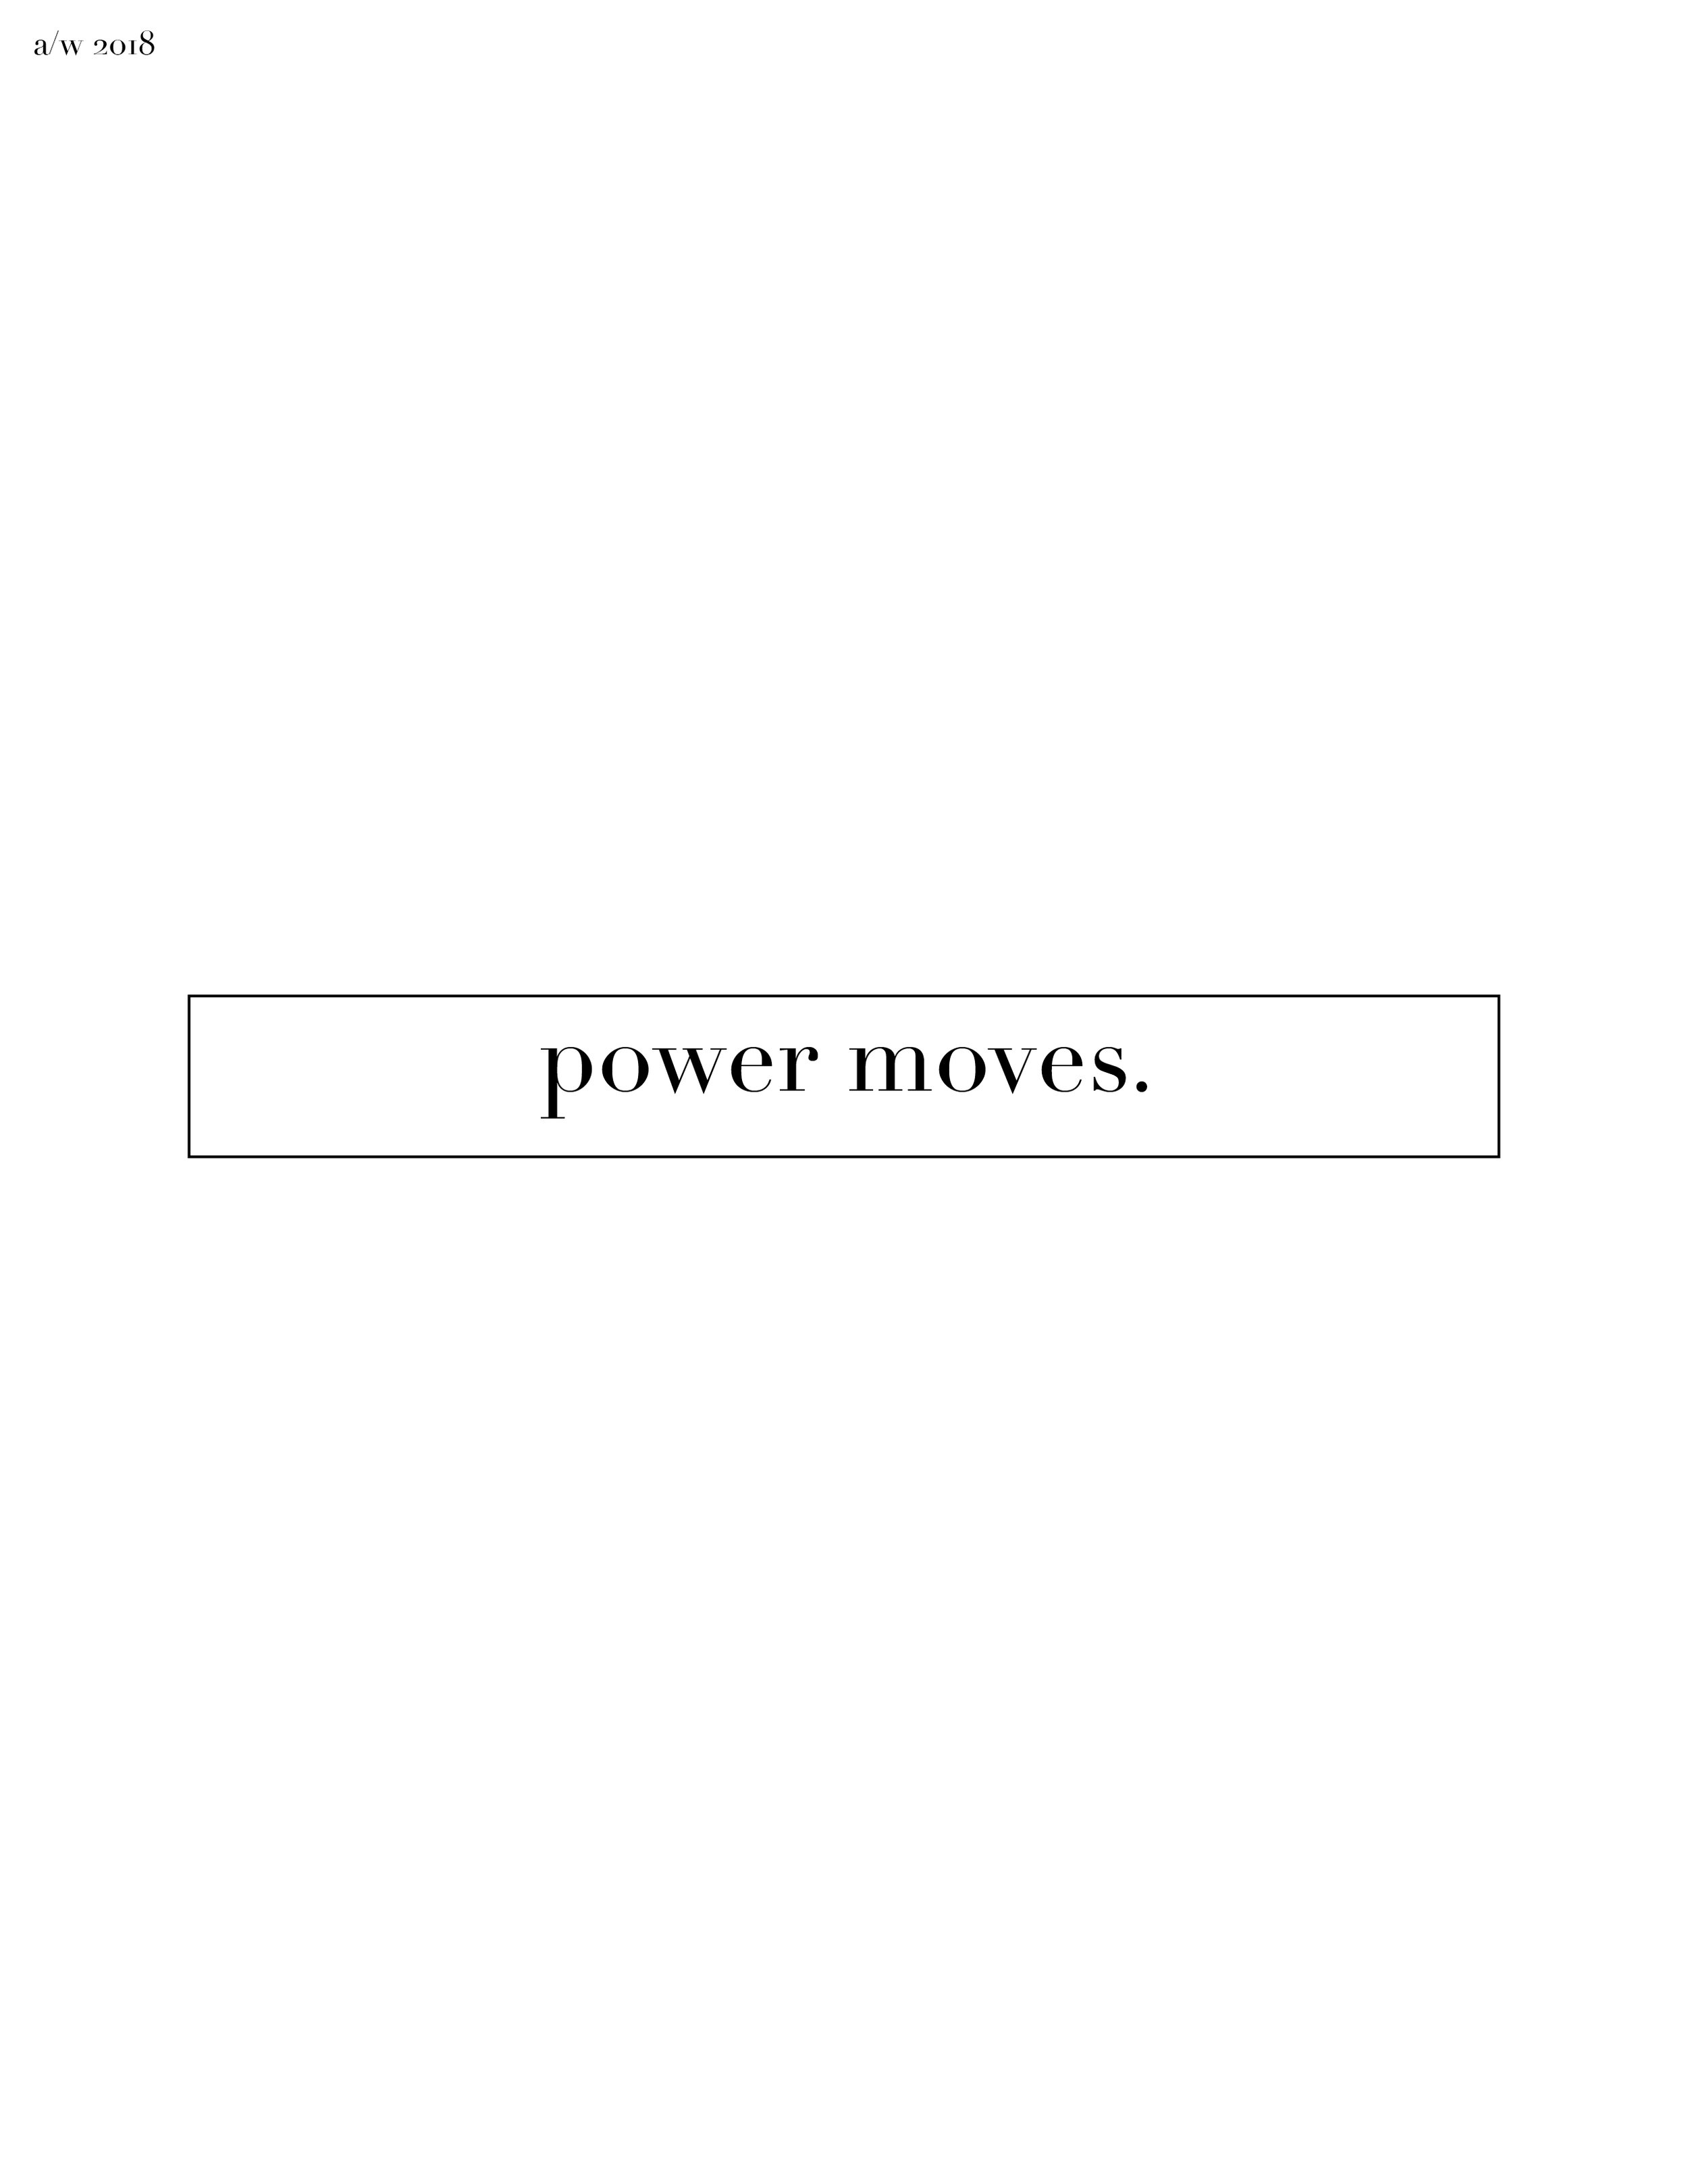 PowerMoves_SierraSnow.jpg